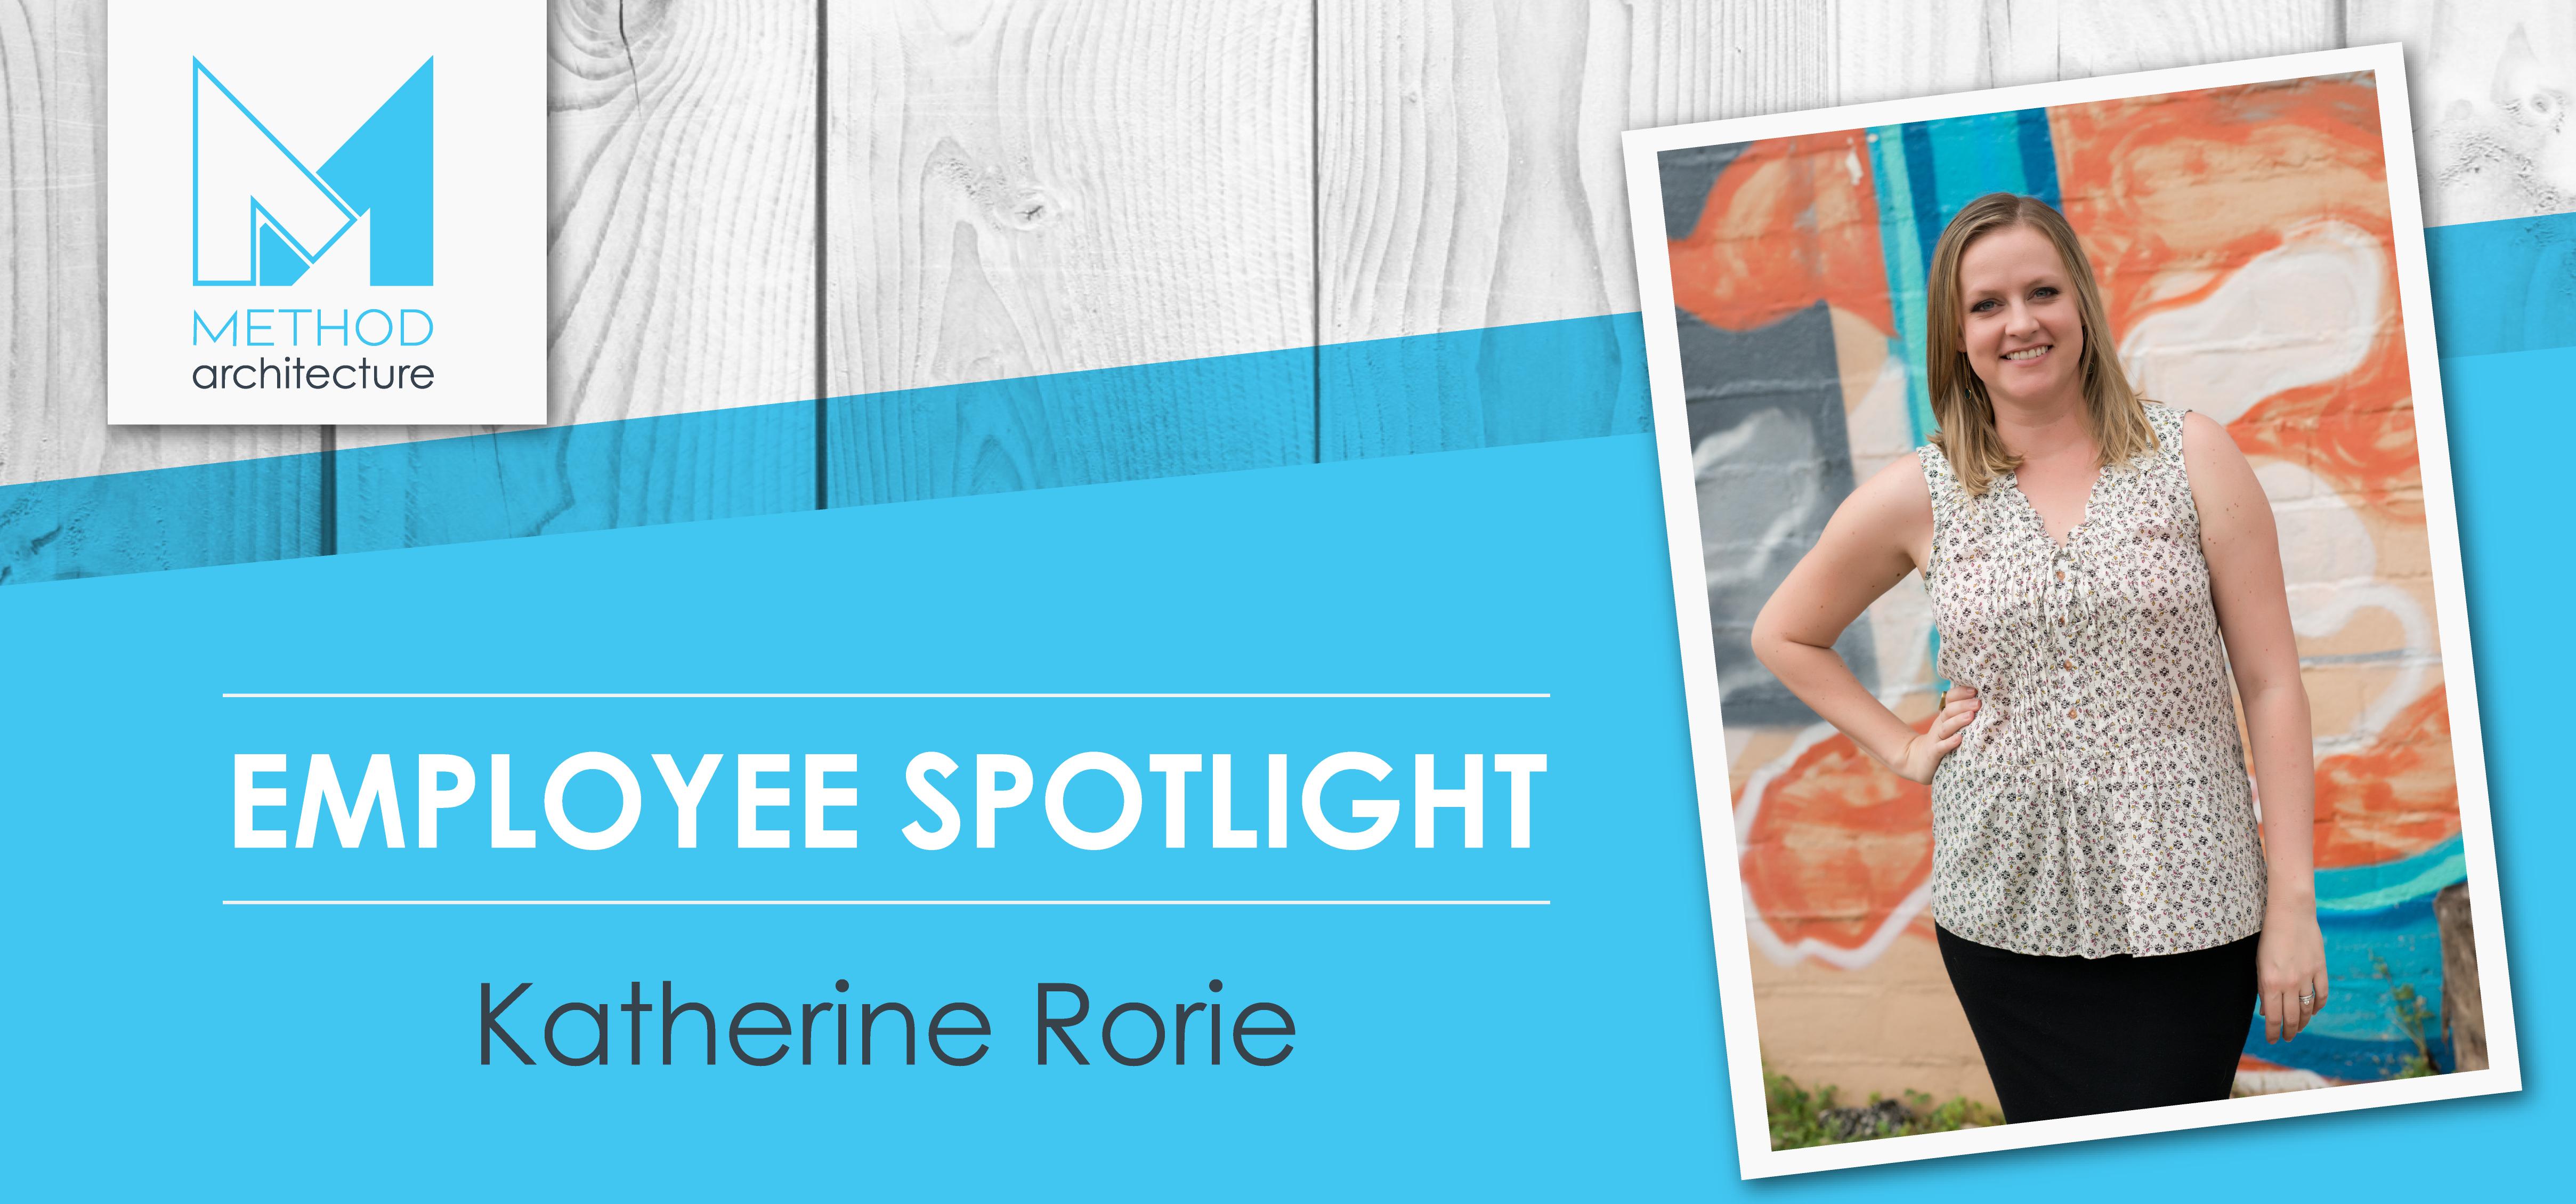 Employee Spotlight: Katherine Rorie